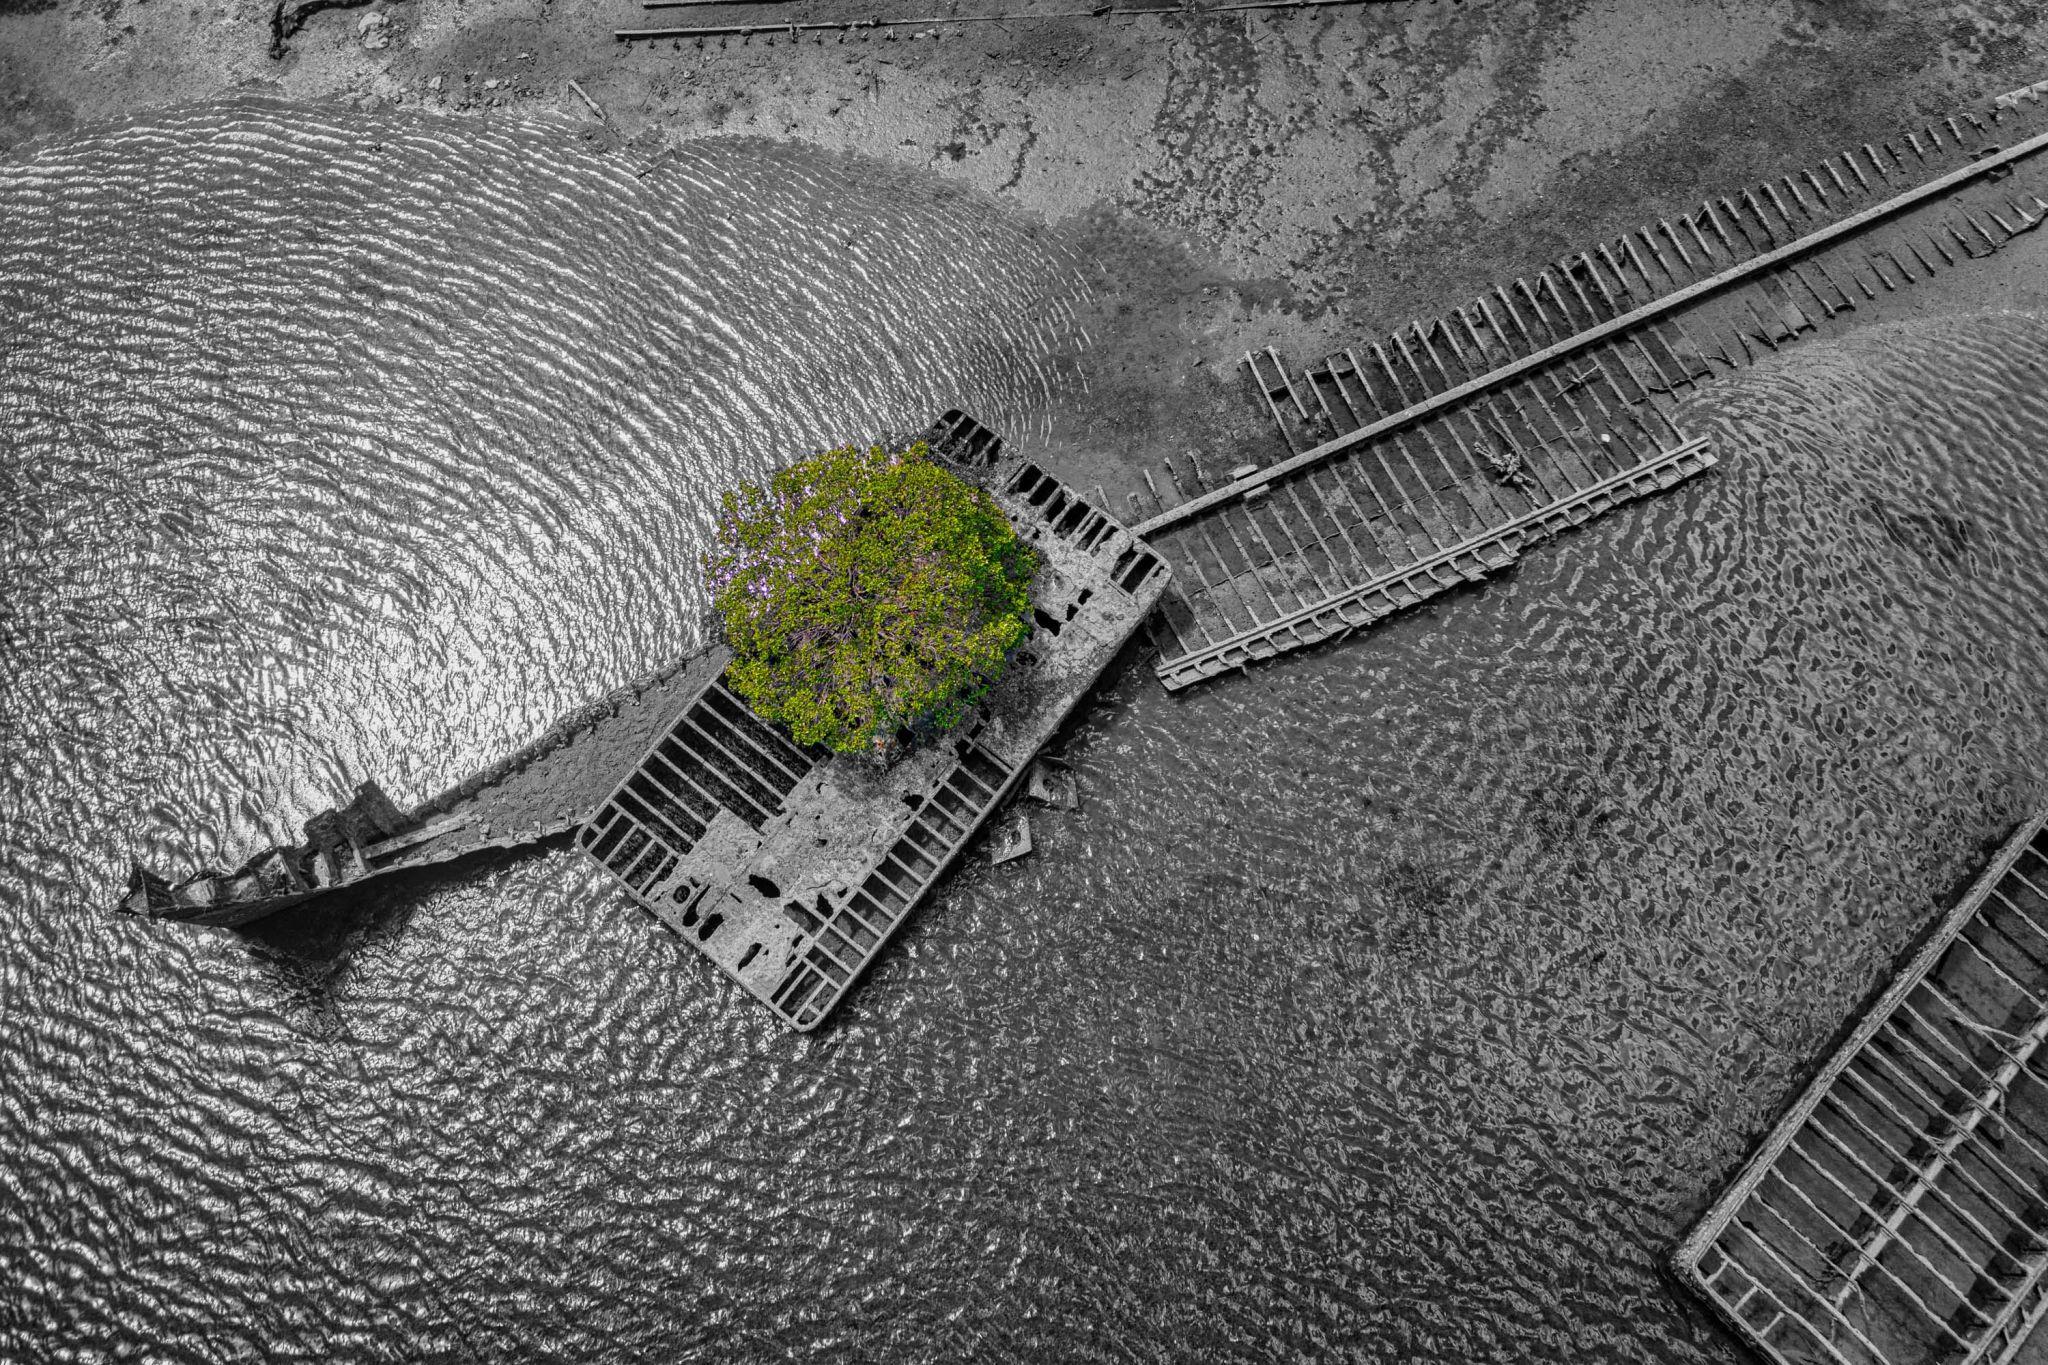 Garden Island Ships Graveyard Port Adelaide, South Australia, Australia